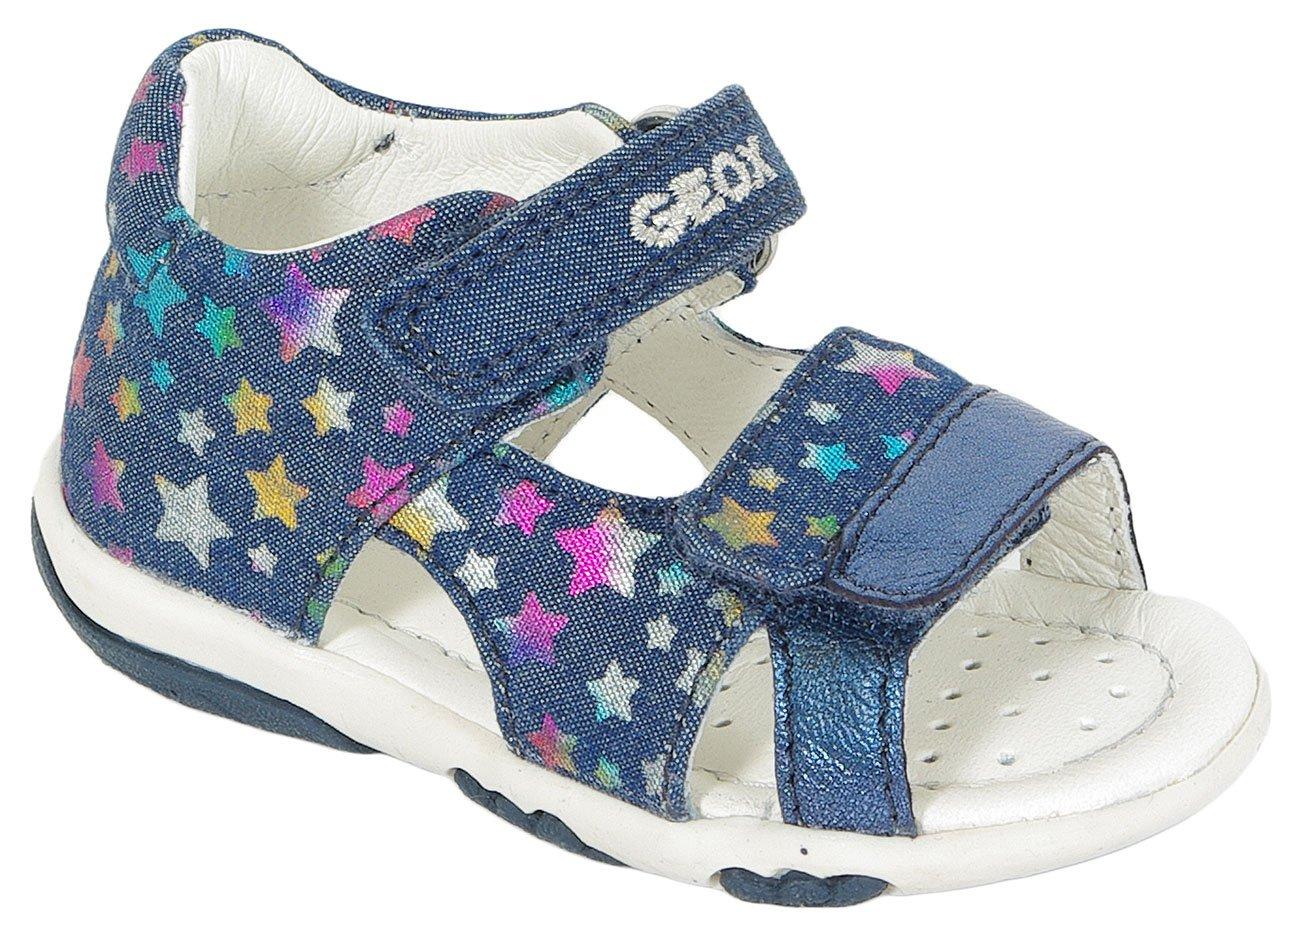 GEOX Nicely B S Pr Jeans+Met Goa Navy/Multicolor sandały